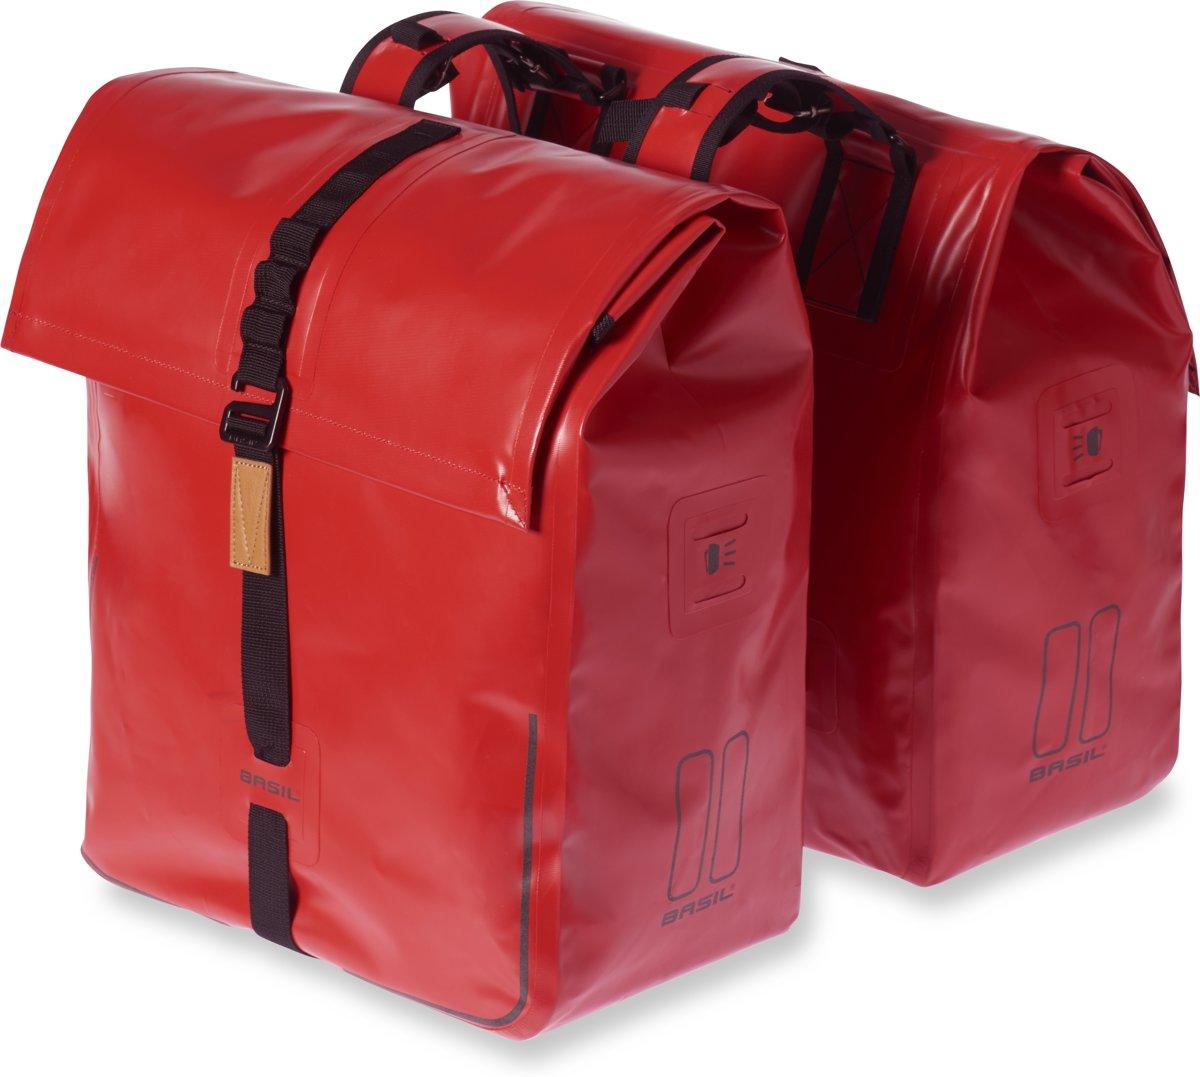 4ce34e5ddf2 bol.com | Basil Urban Dry Dubbele Fietstas - 50 Liter - Solid Red